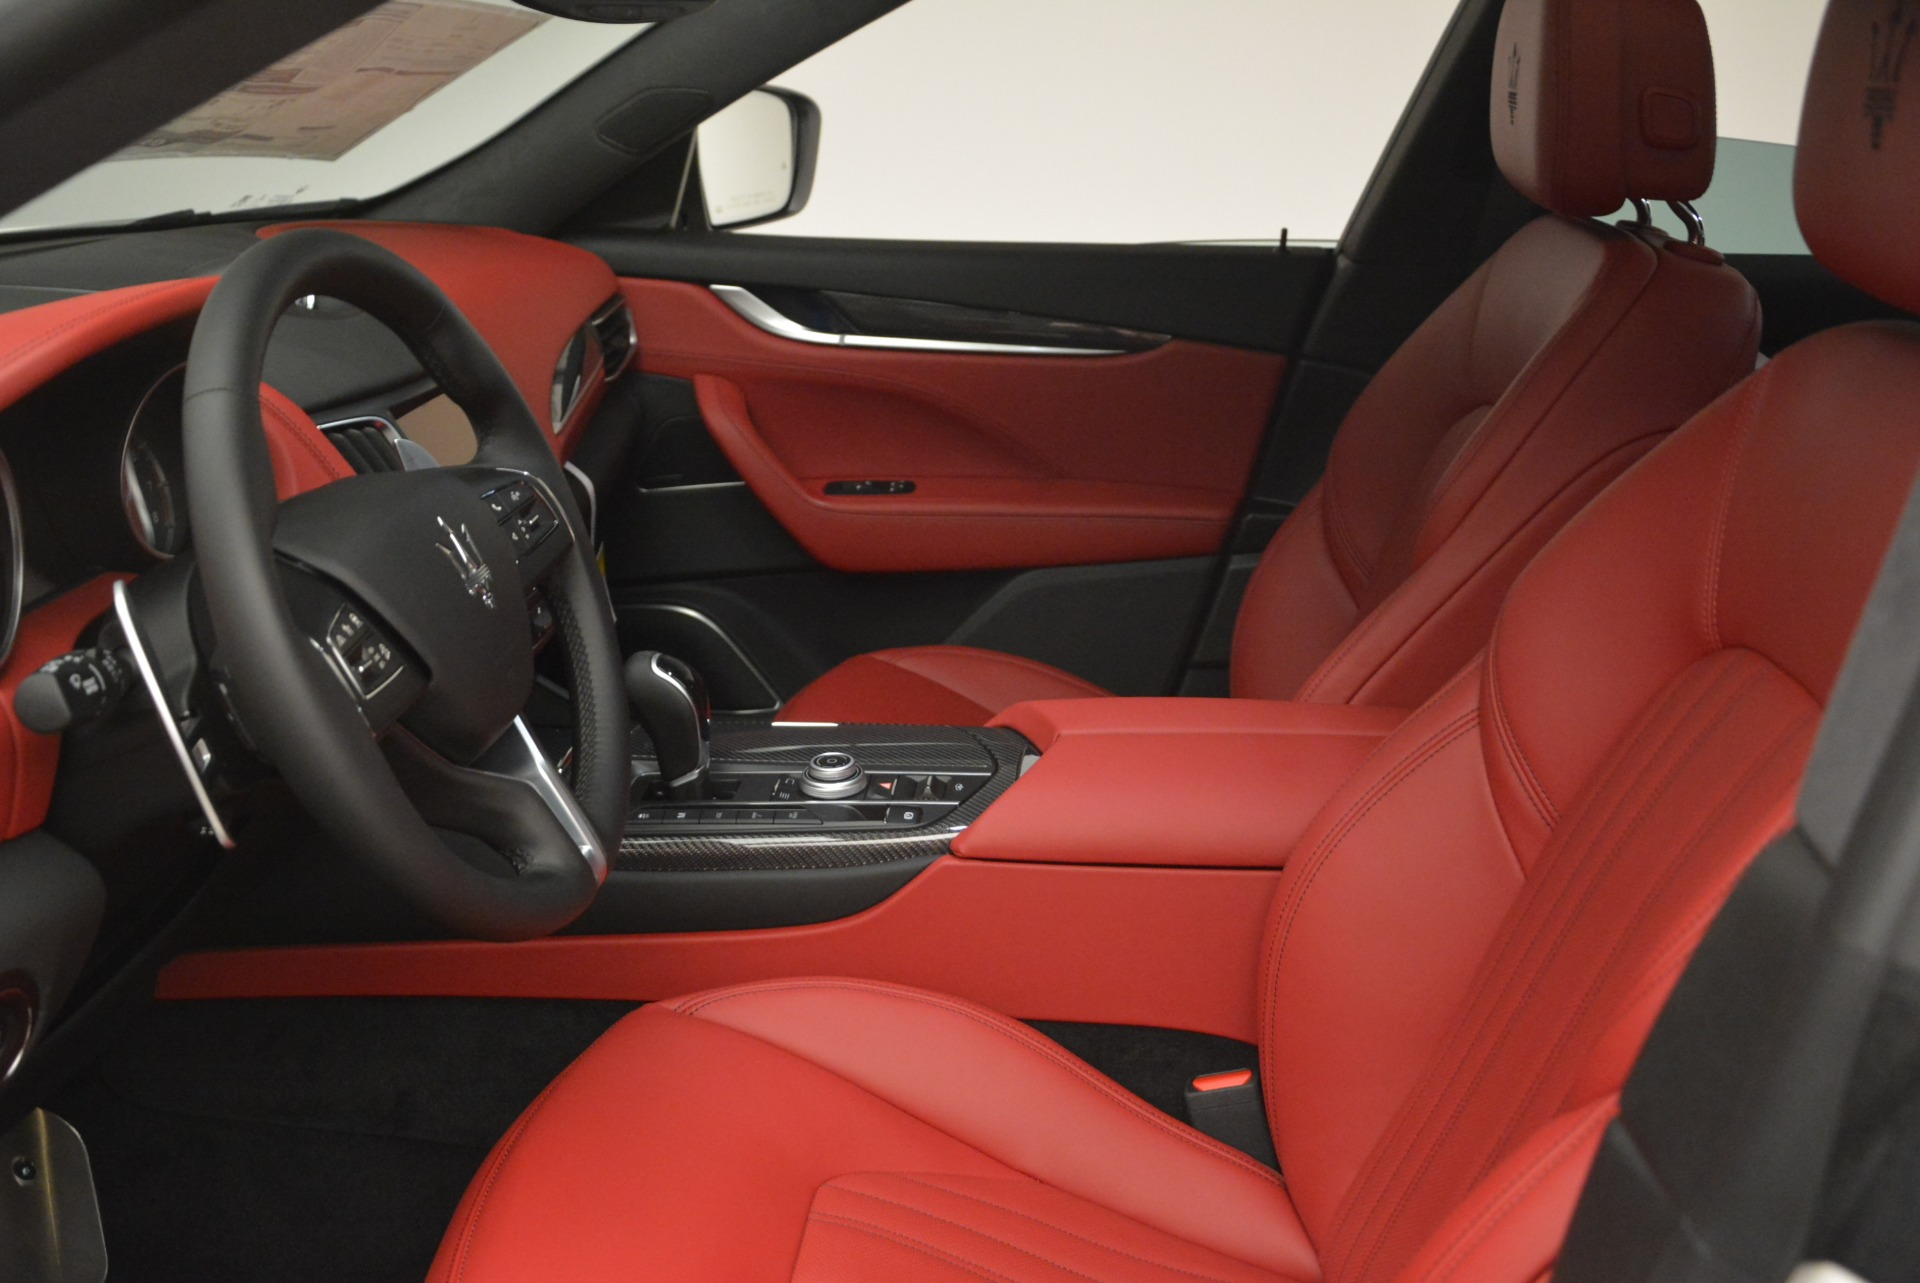 New-2019-Maserati-Levante-S-Q4-GranLusso